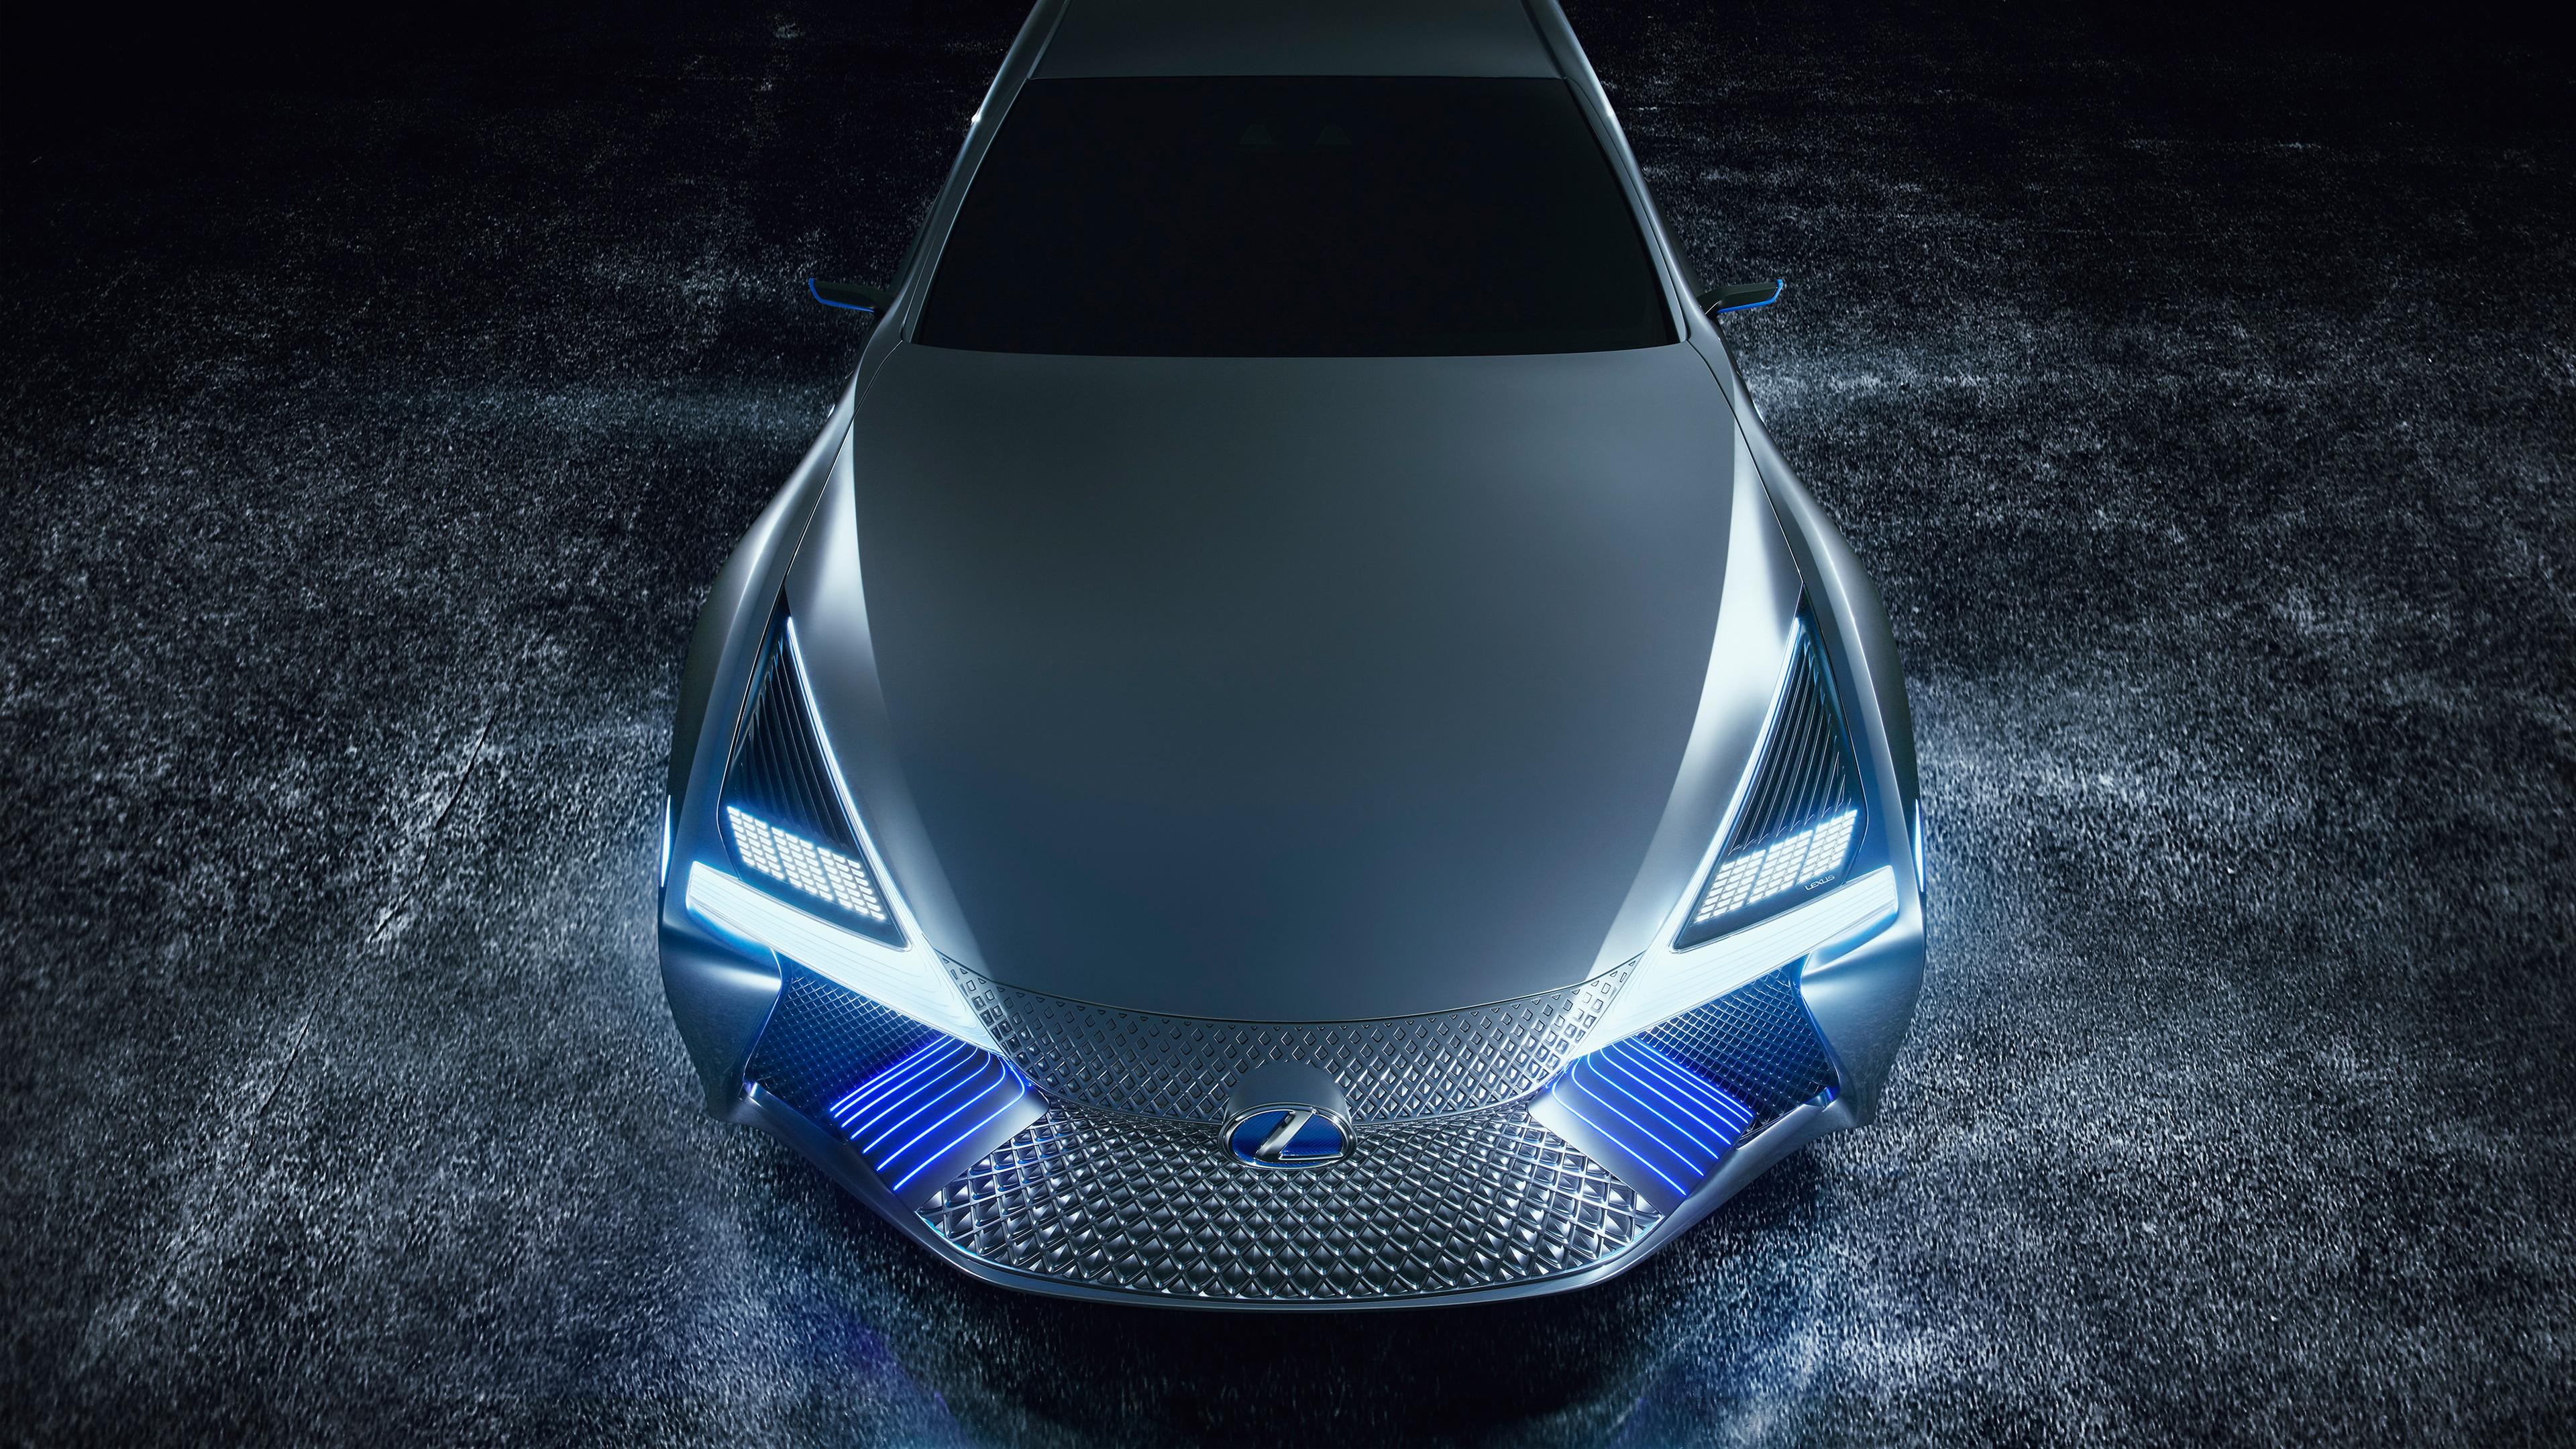 2017 Lexus LS Plus Concept 4K 6 Wallpaper | HD Car ...